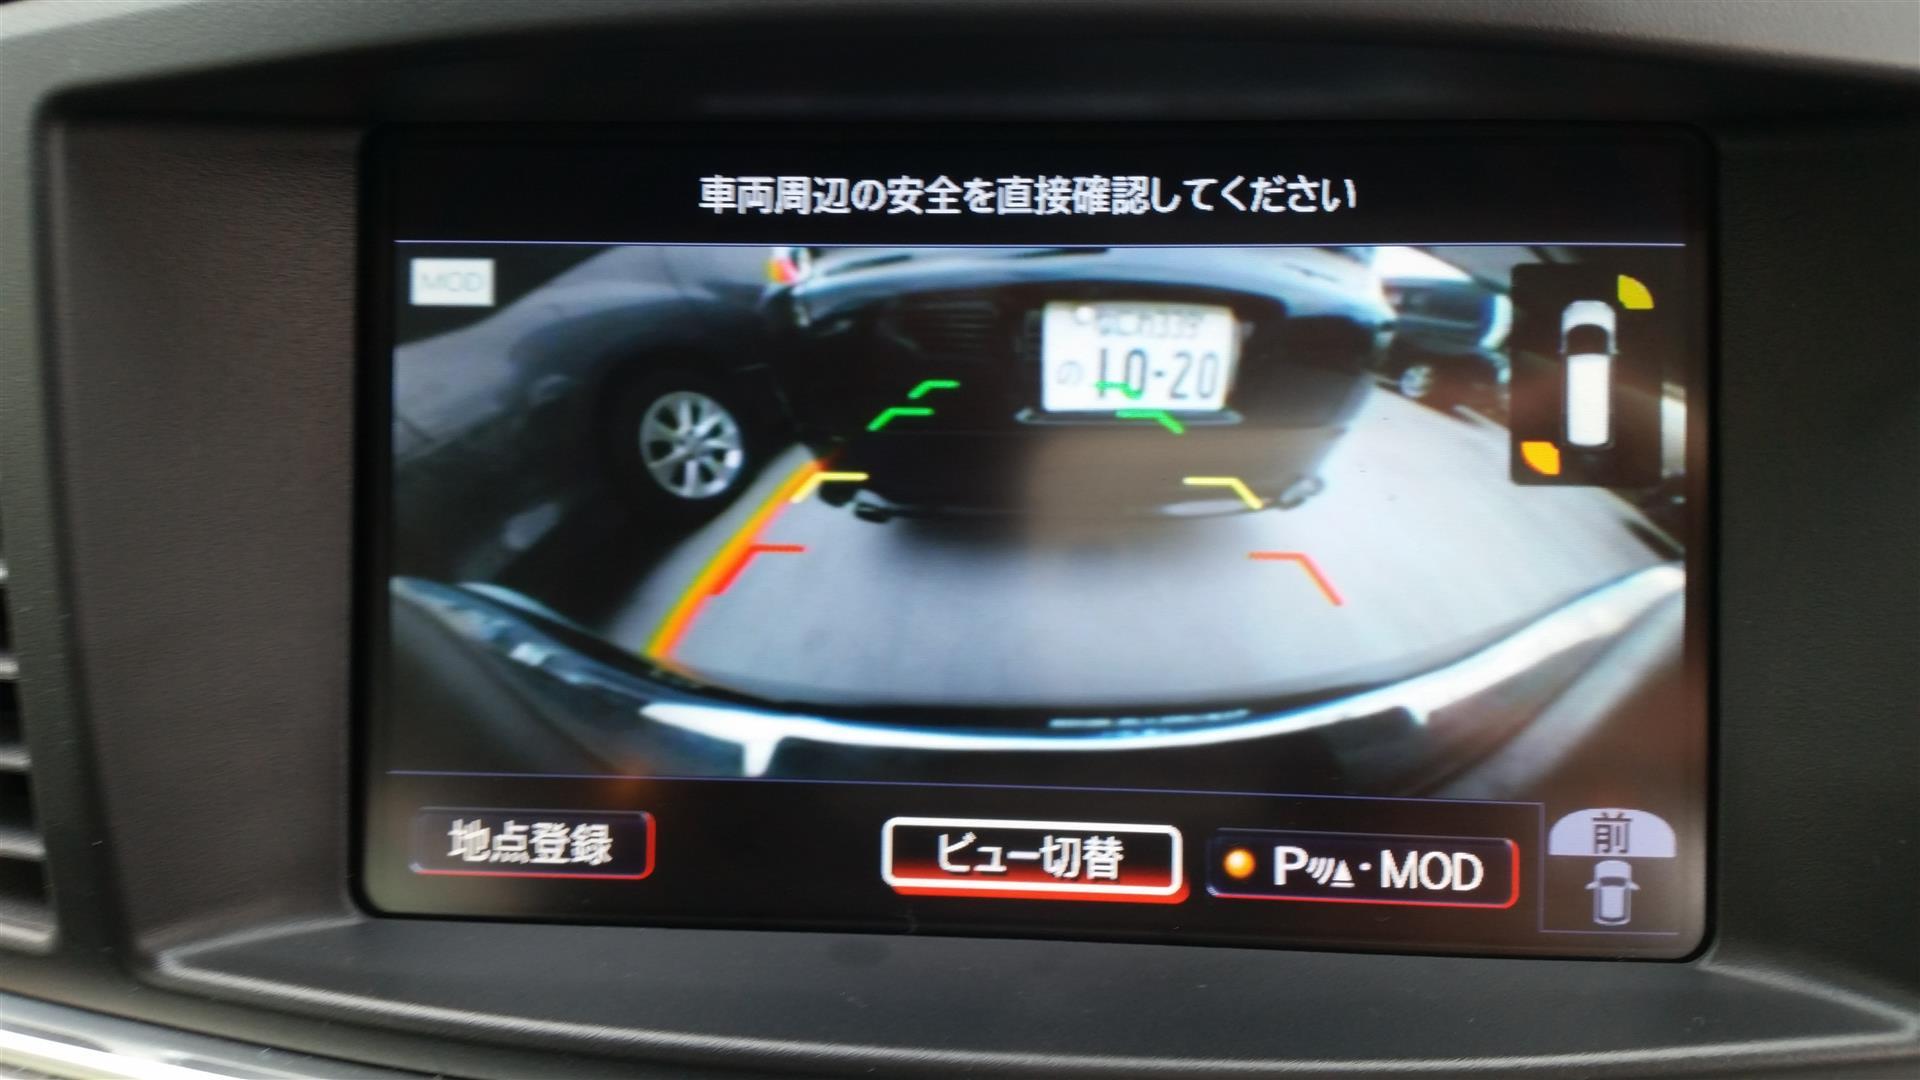 2012 Nissan Elgrand E52 20150627_143550 (Large)